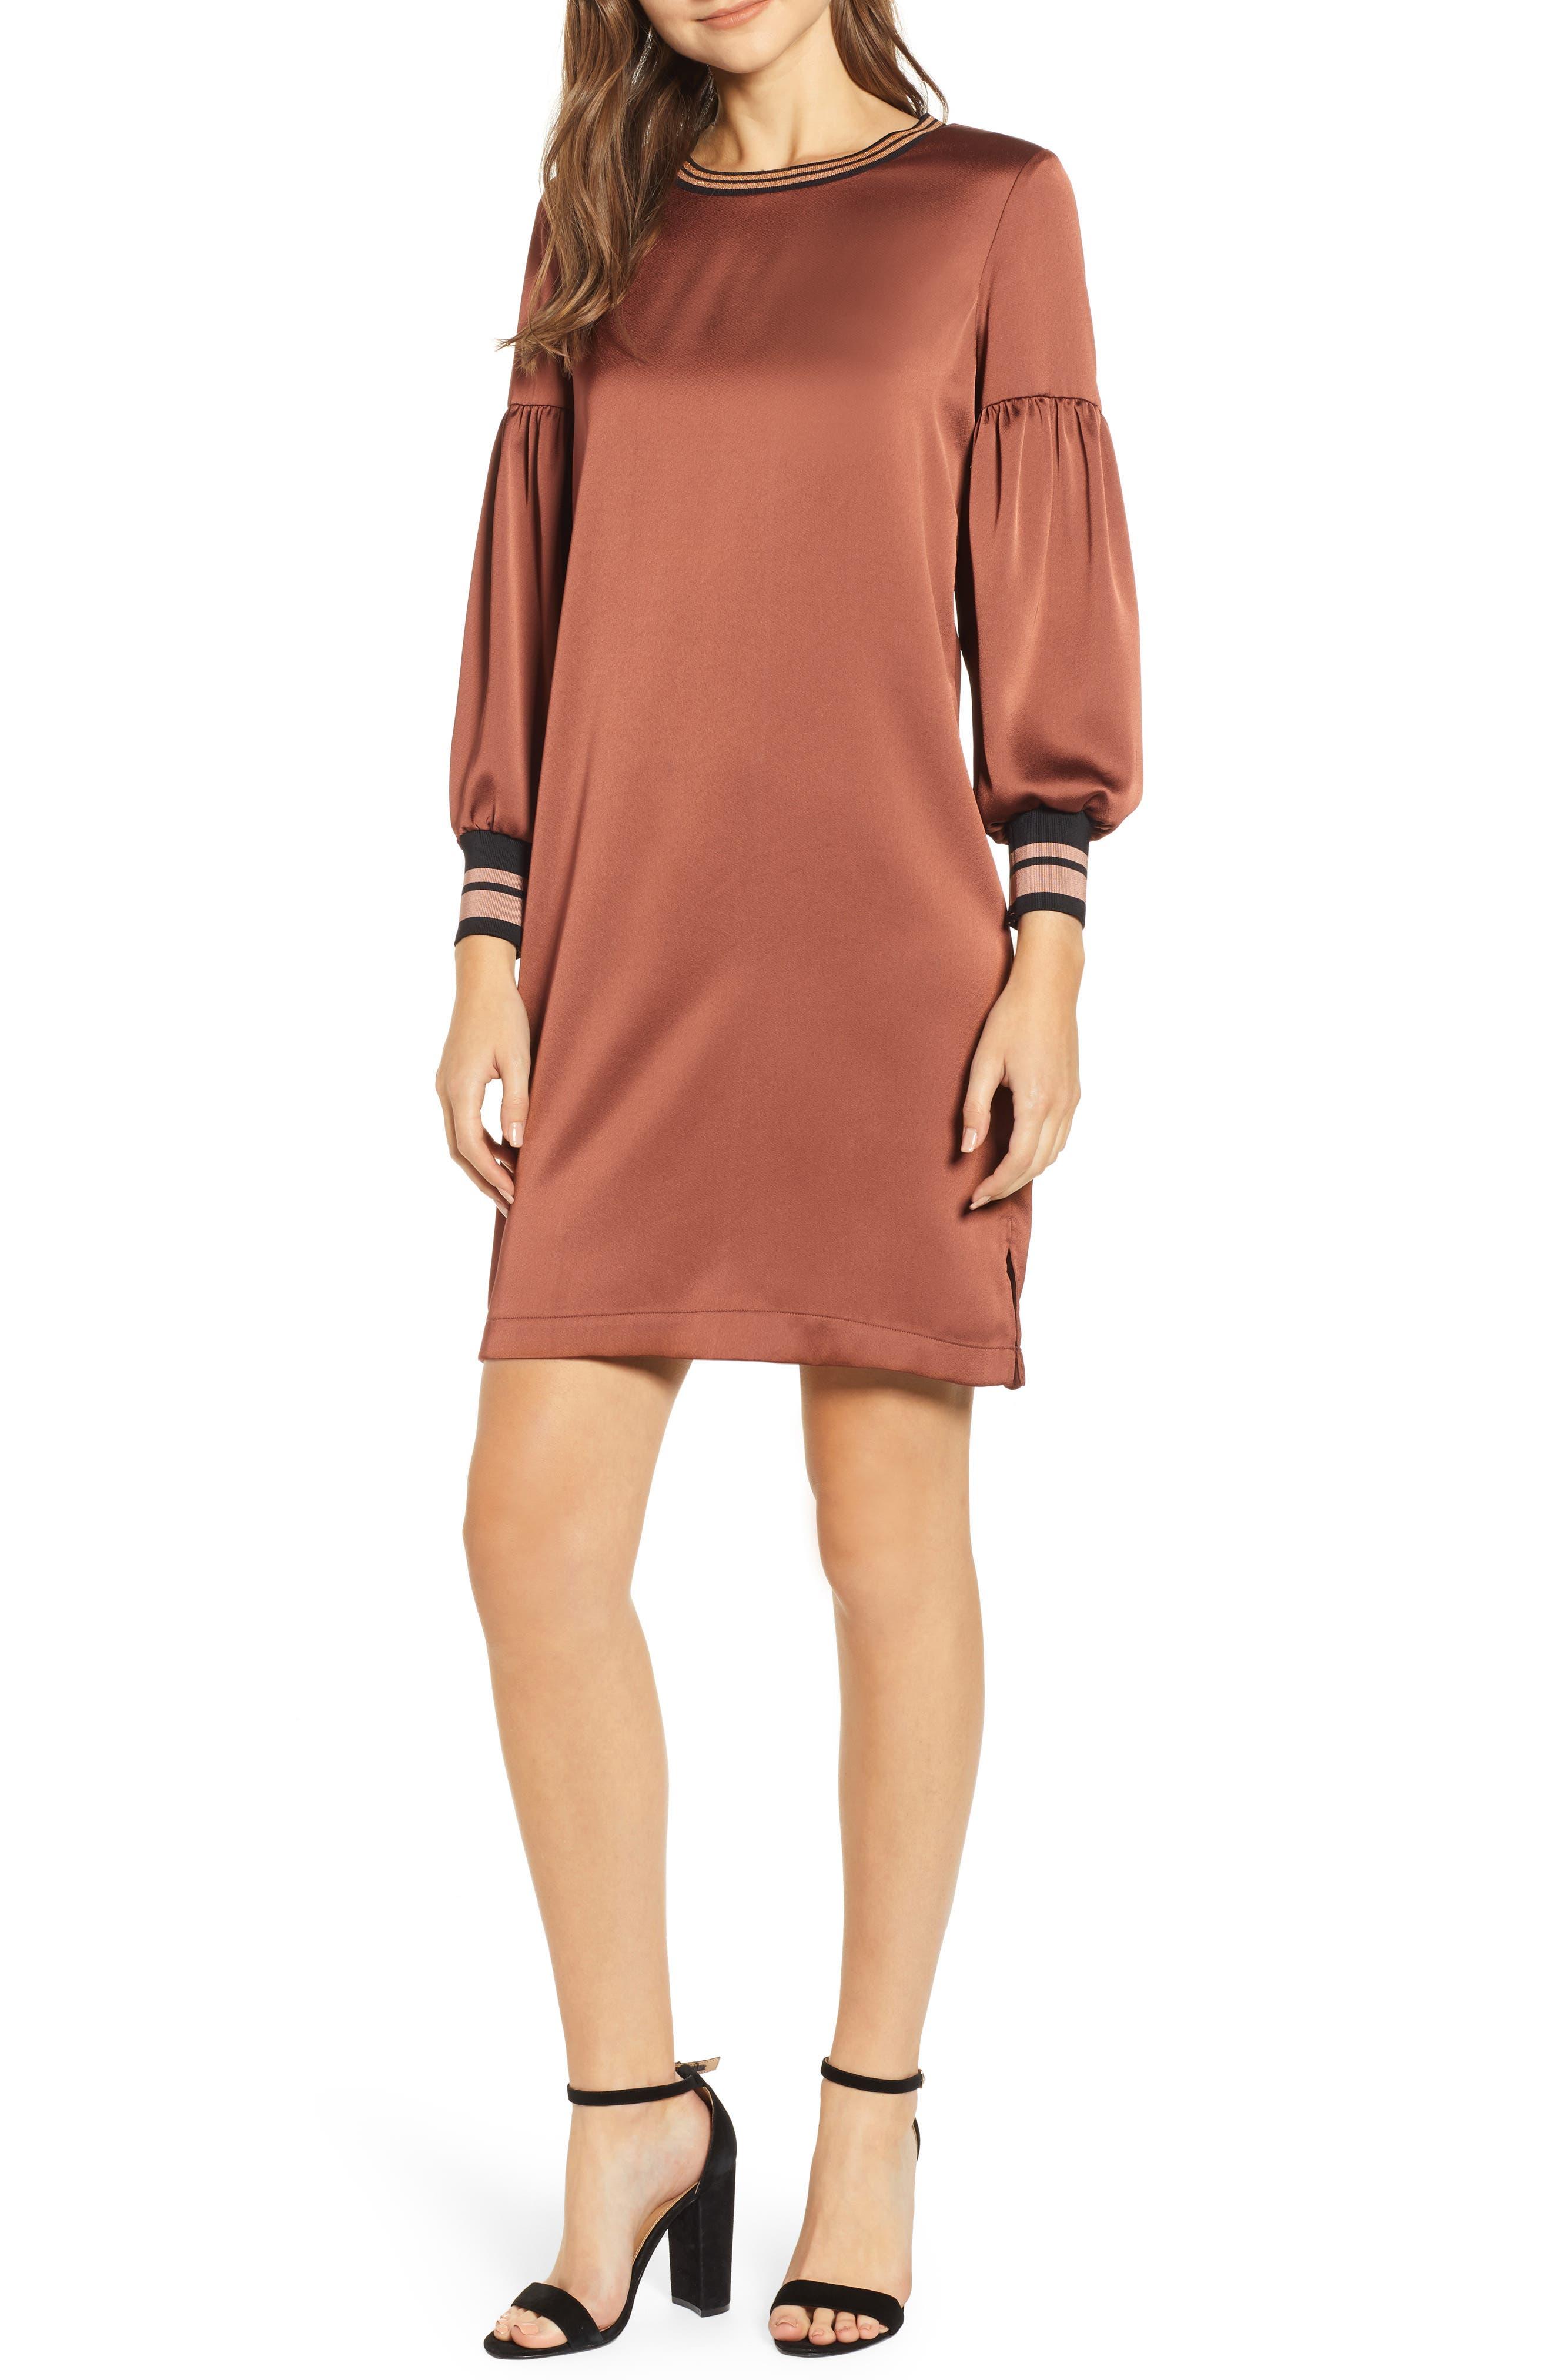 SCOTCH & SODA Voluminous Sleeve Shift Dress in Brick